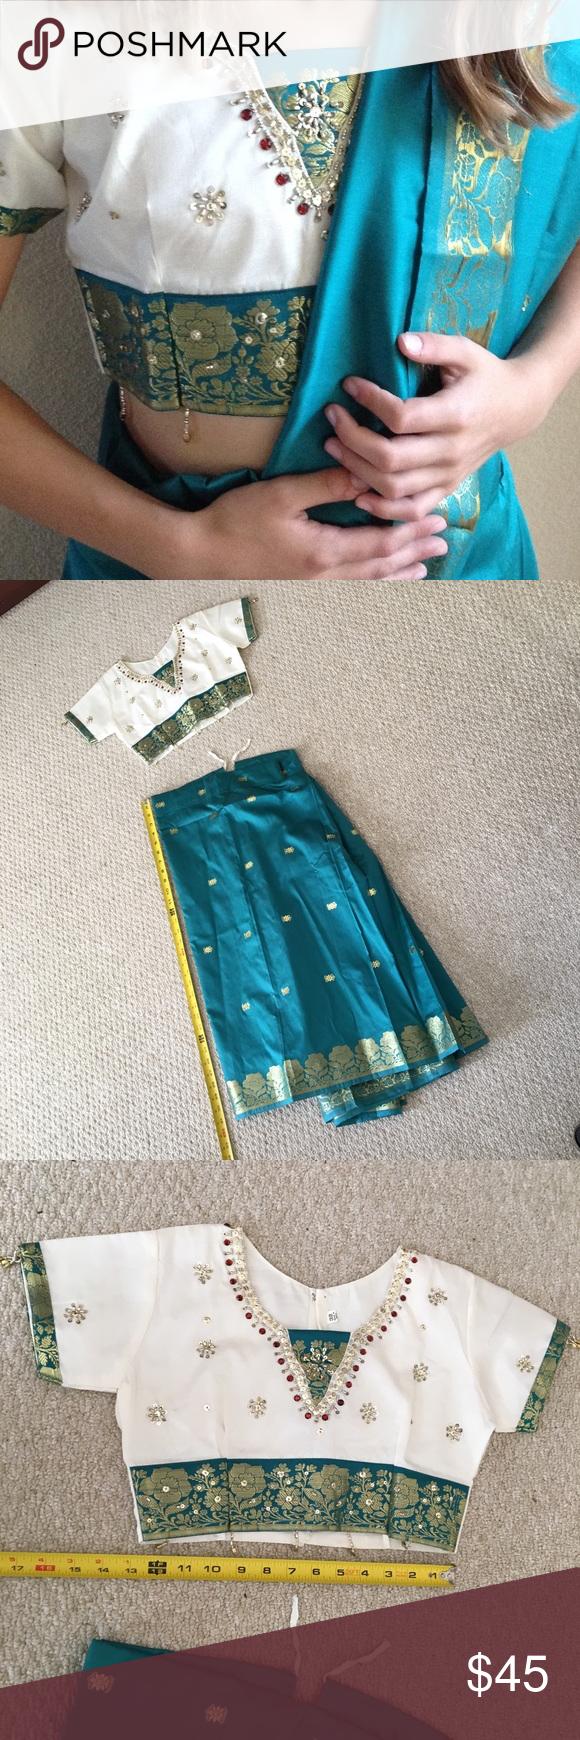 Childrenus sari india for yrs old indian bollywood scarf